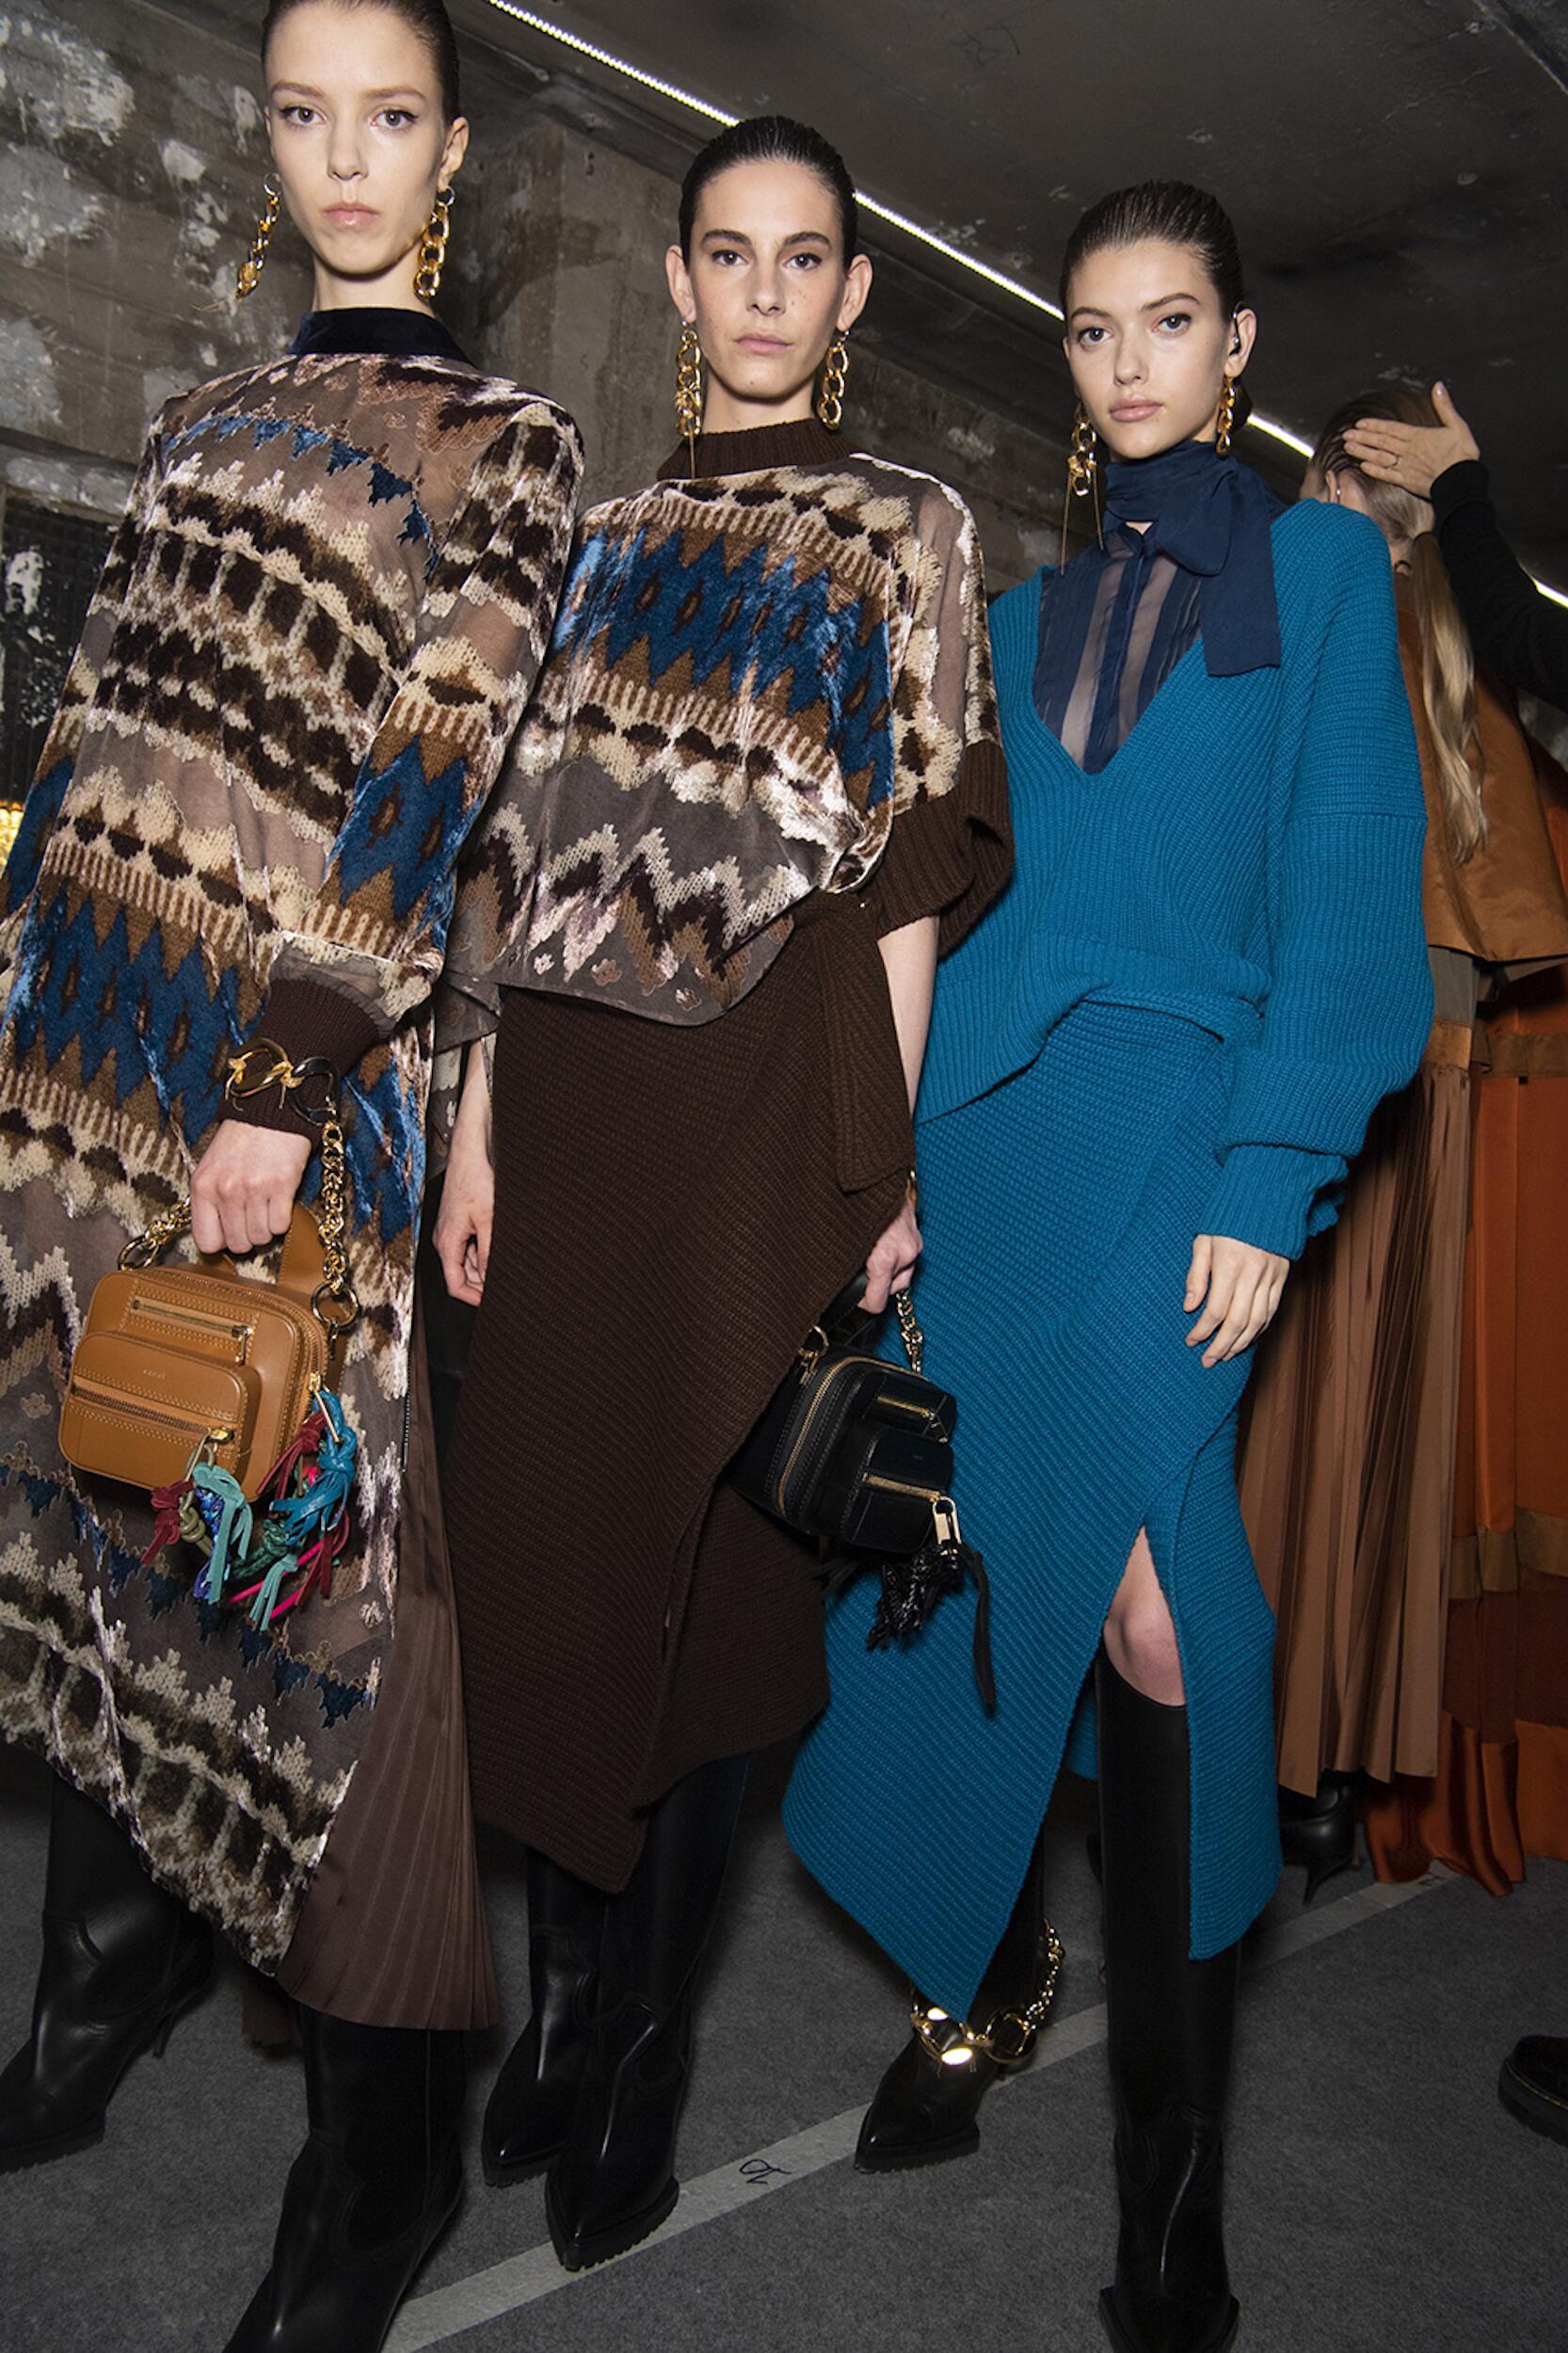 Backstage Sacai Women Models 2020 Style